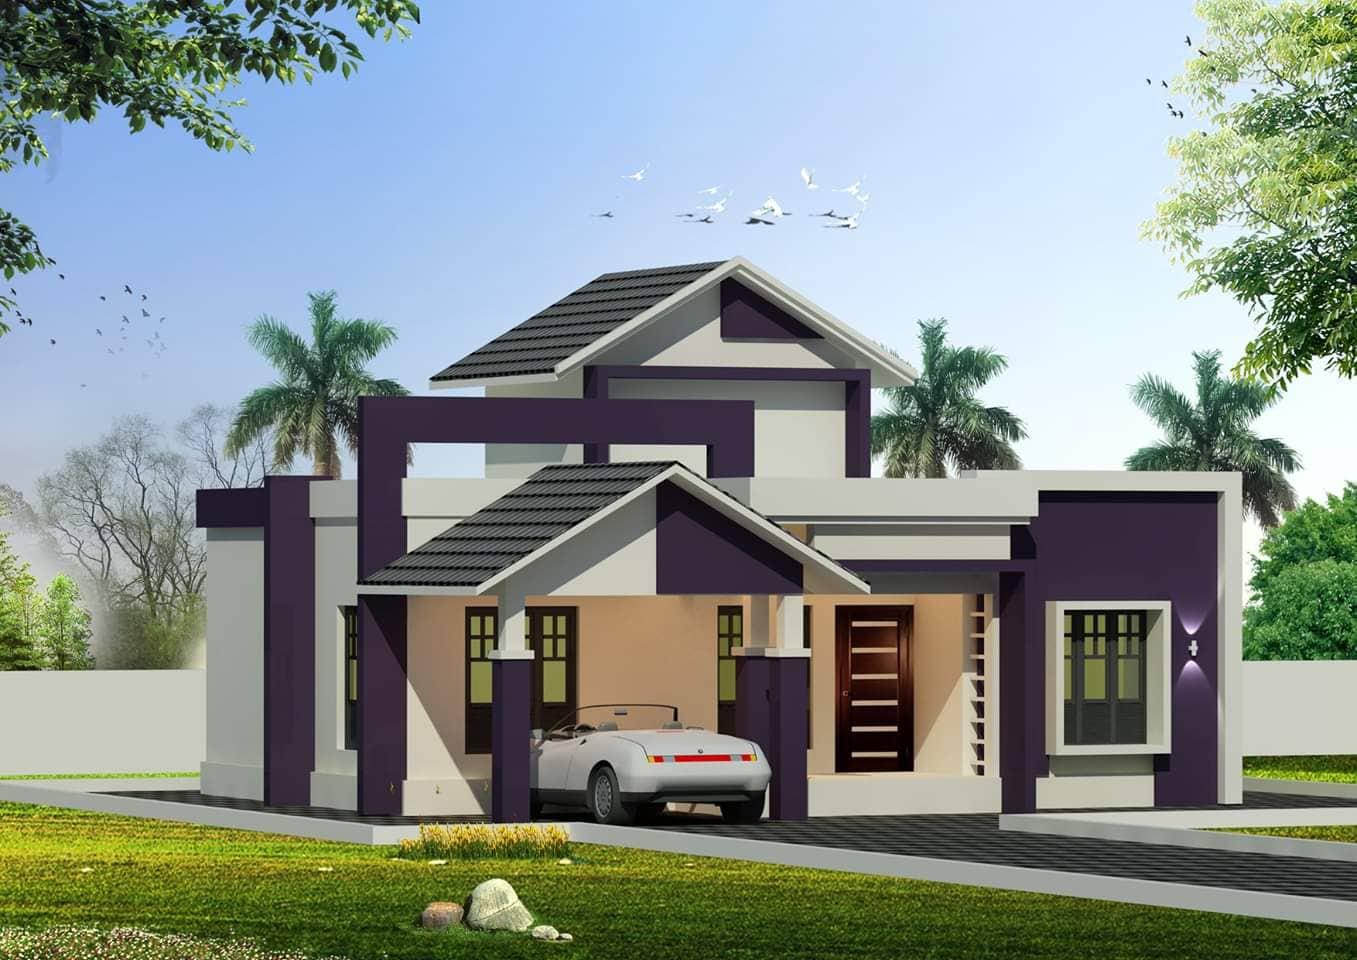 Photo of 1150 Square Feet 2 Bedroom Single Floor Modern Home Design